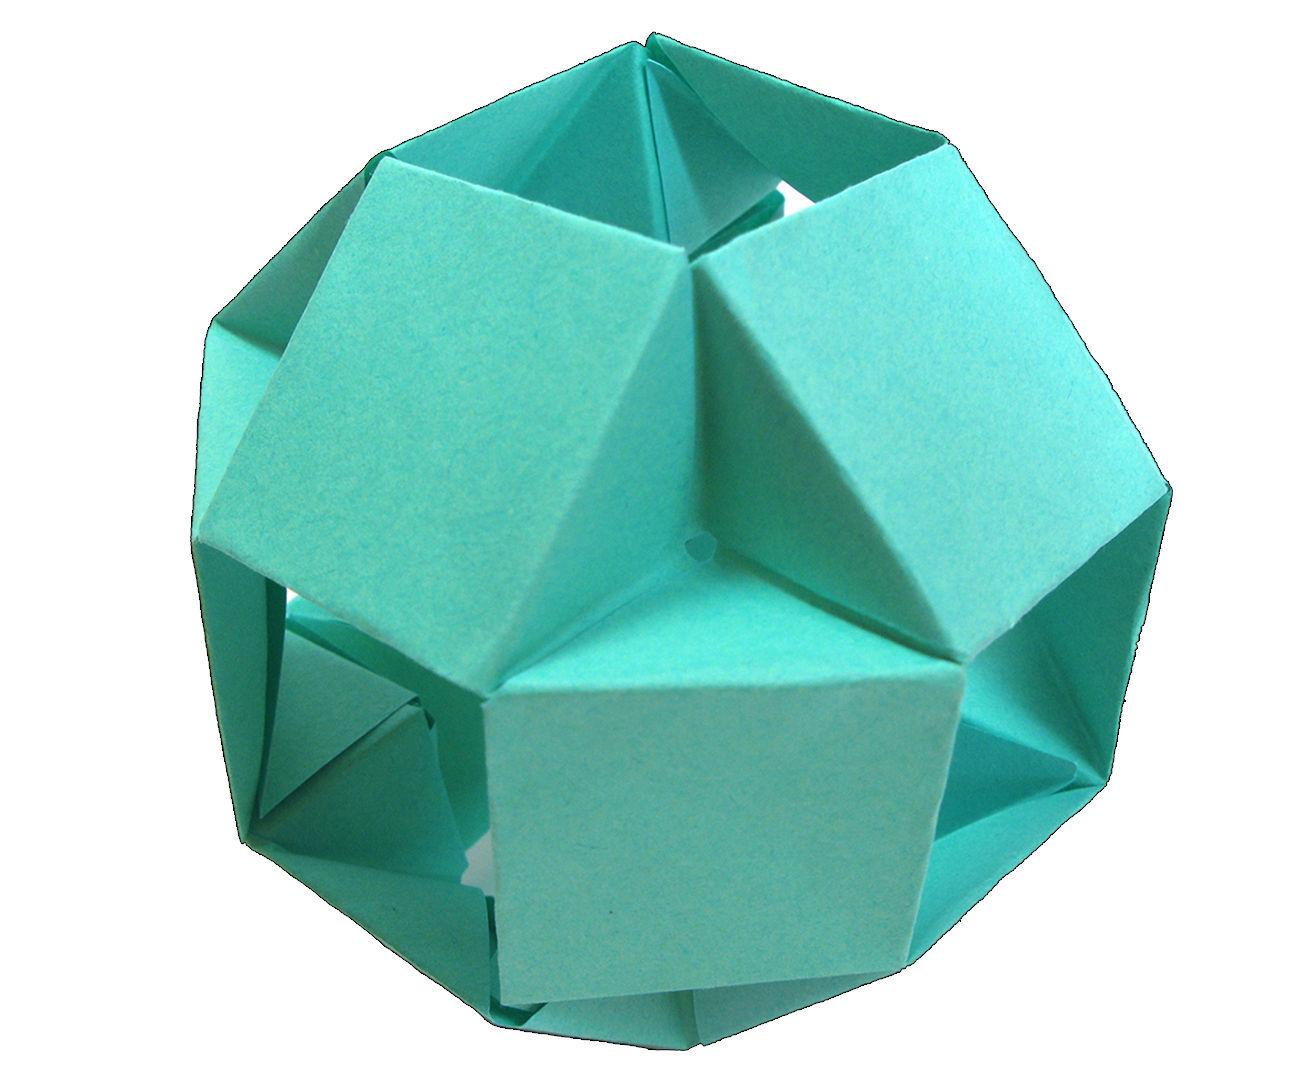 Modular Origami Ball Tutorial 12 Units